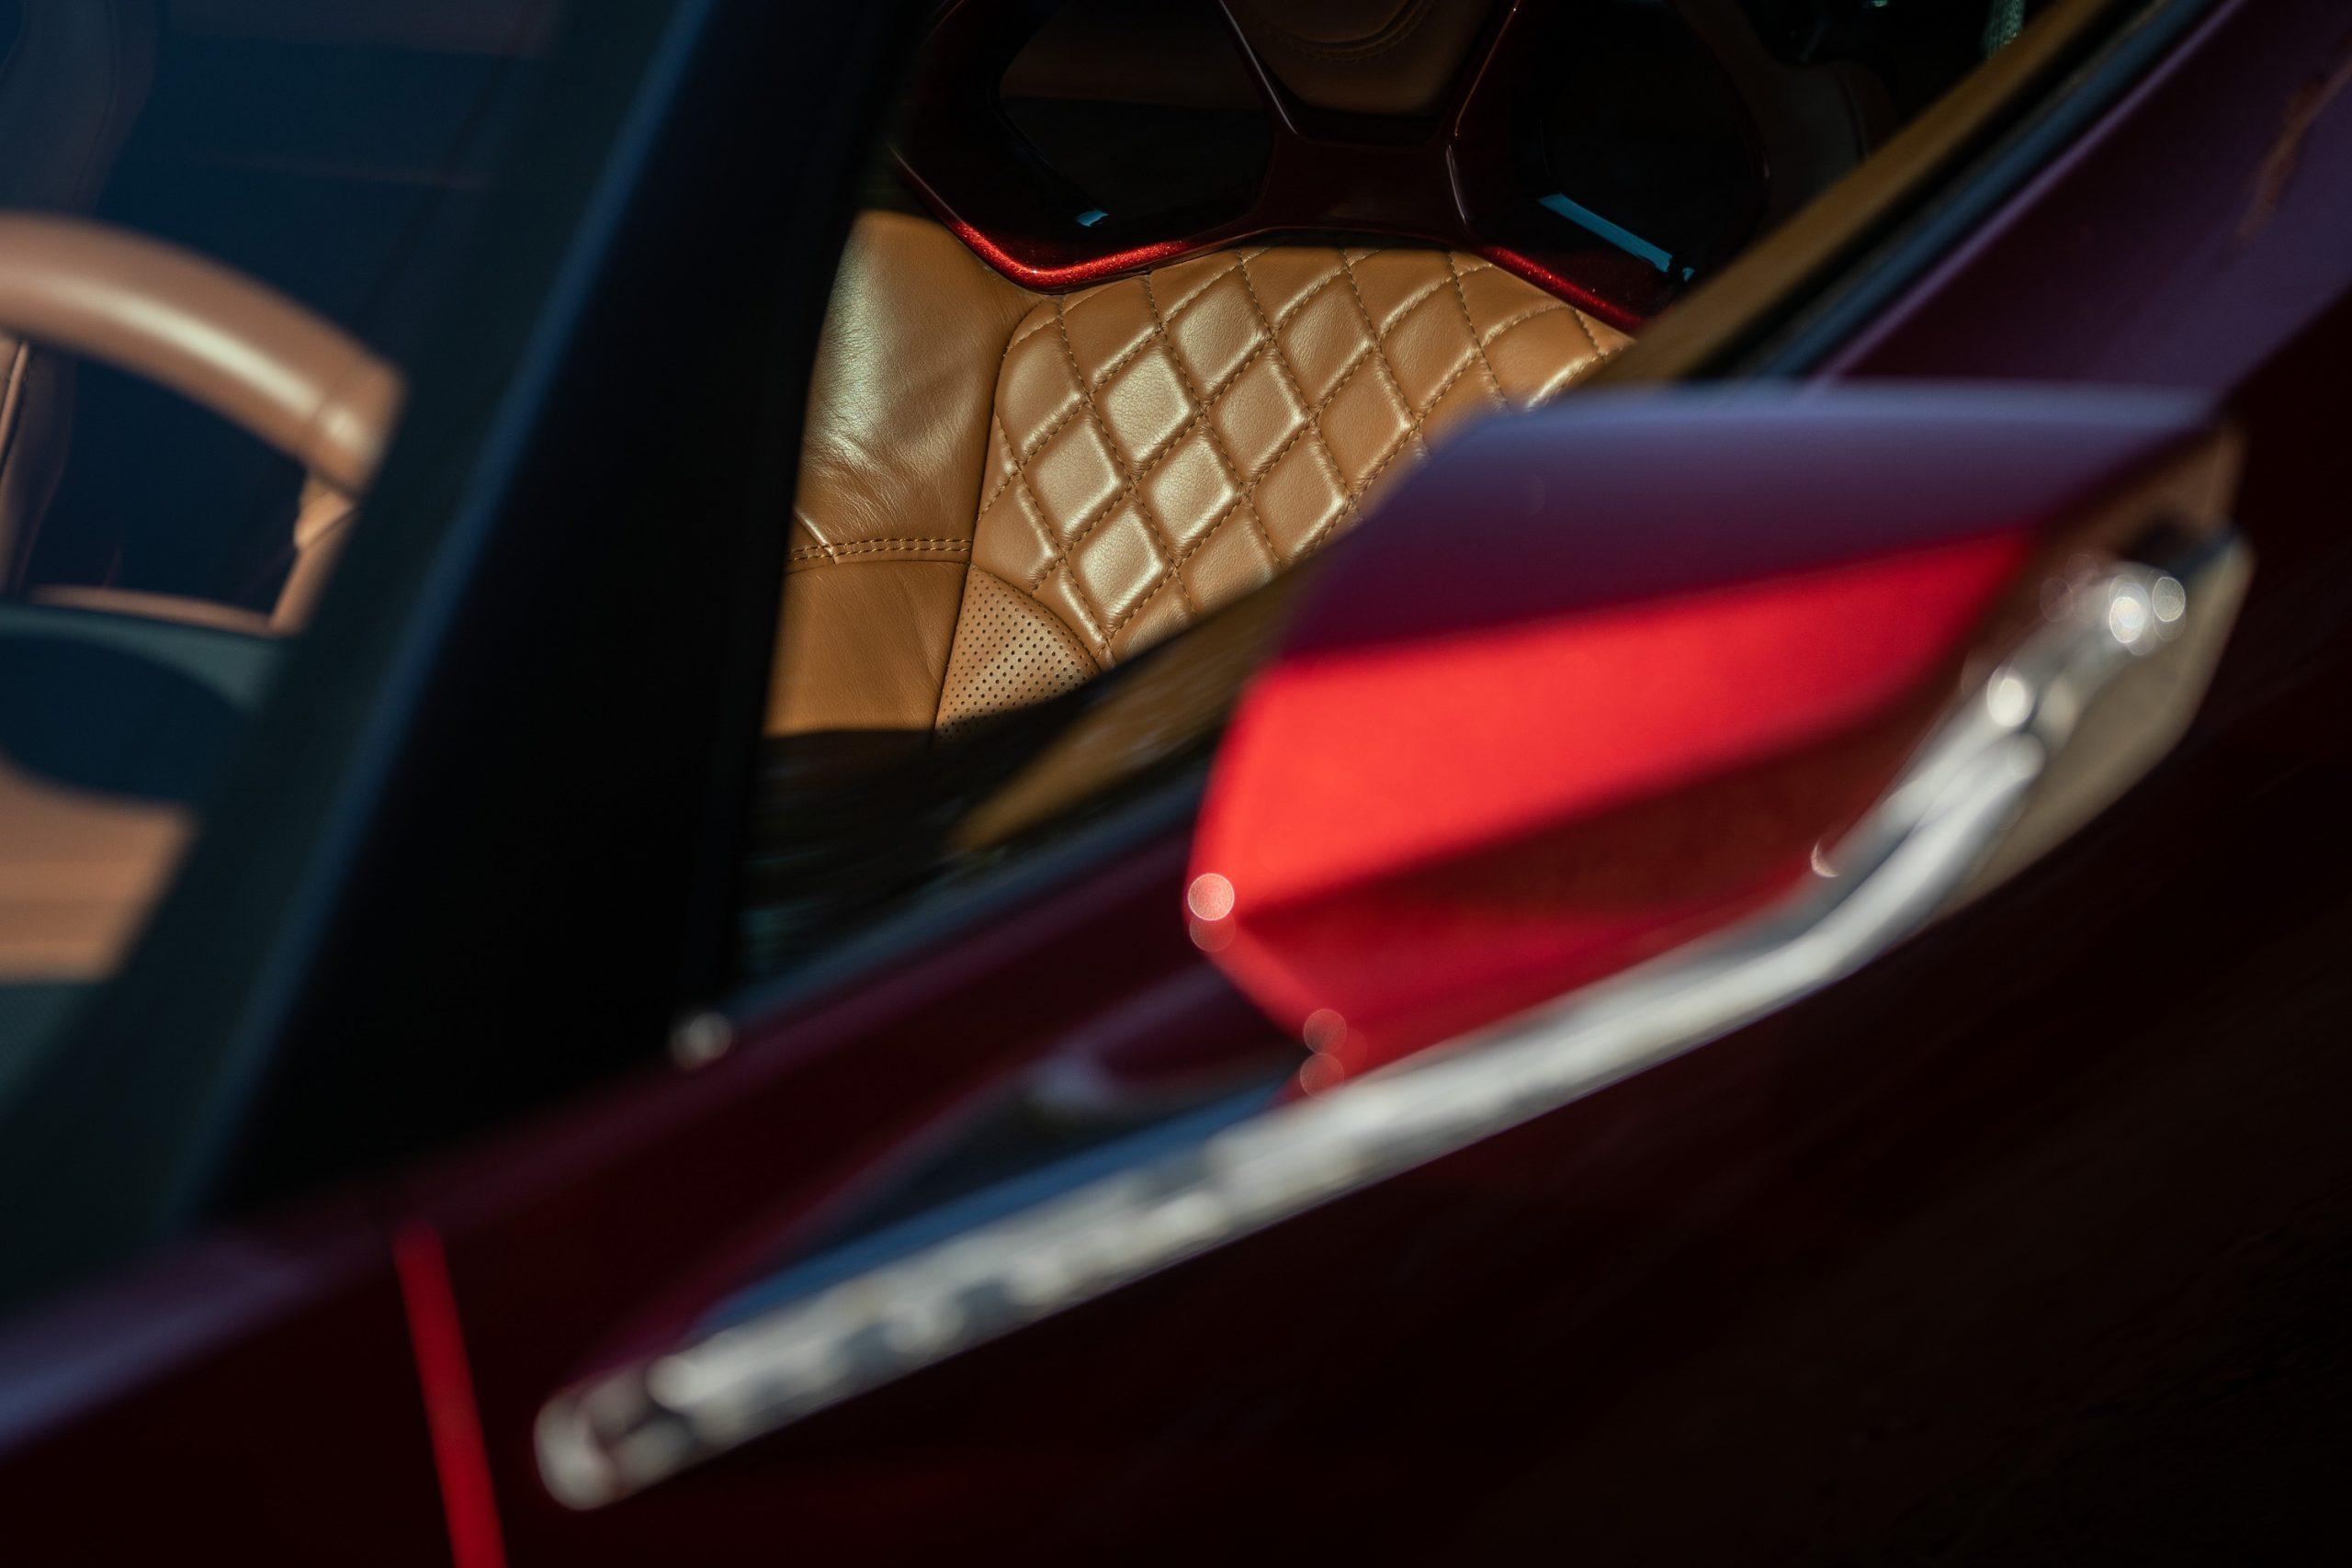 Genovation GXE C7 Corvette Diamond Leather Seat Stitch